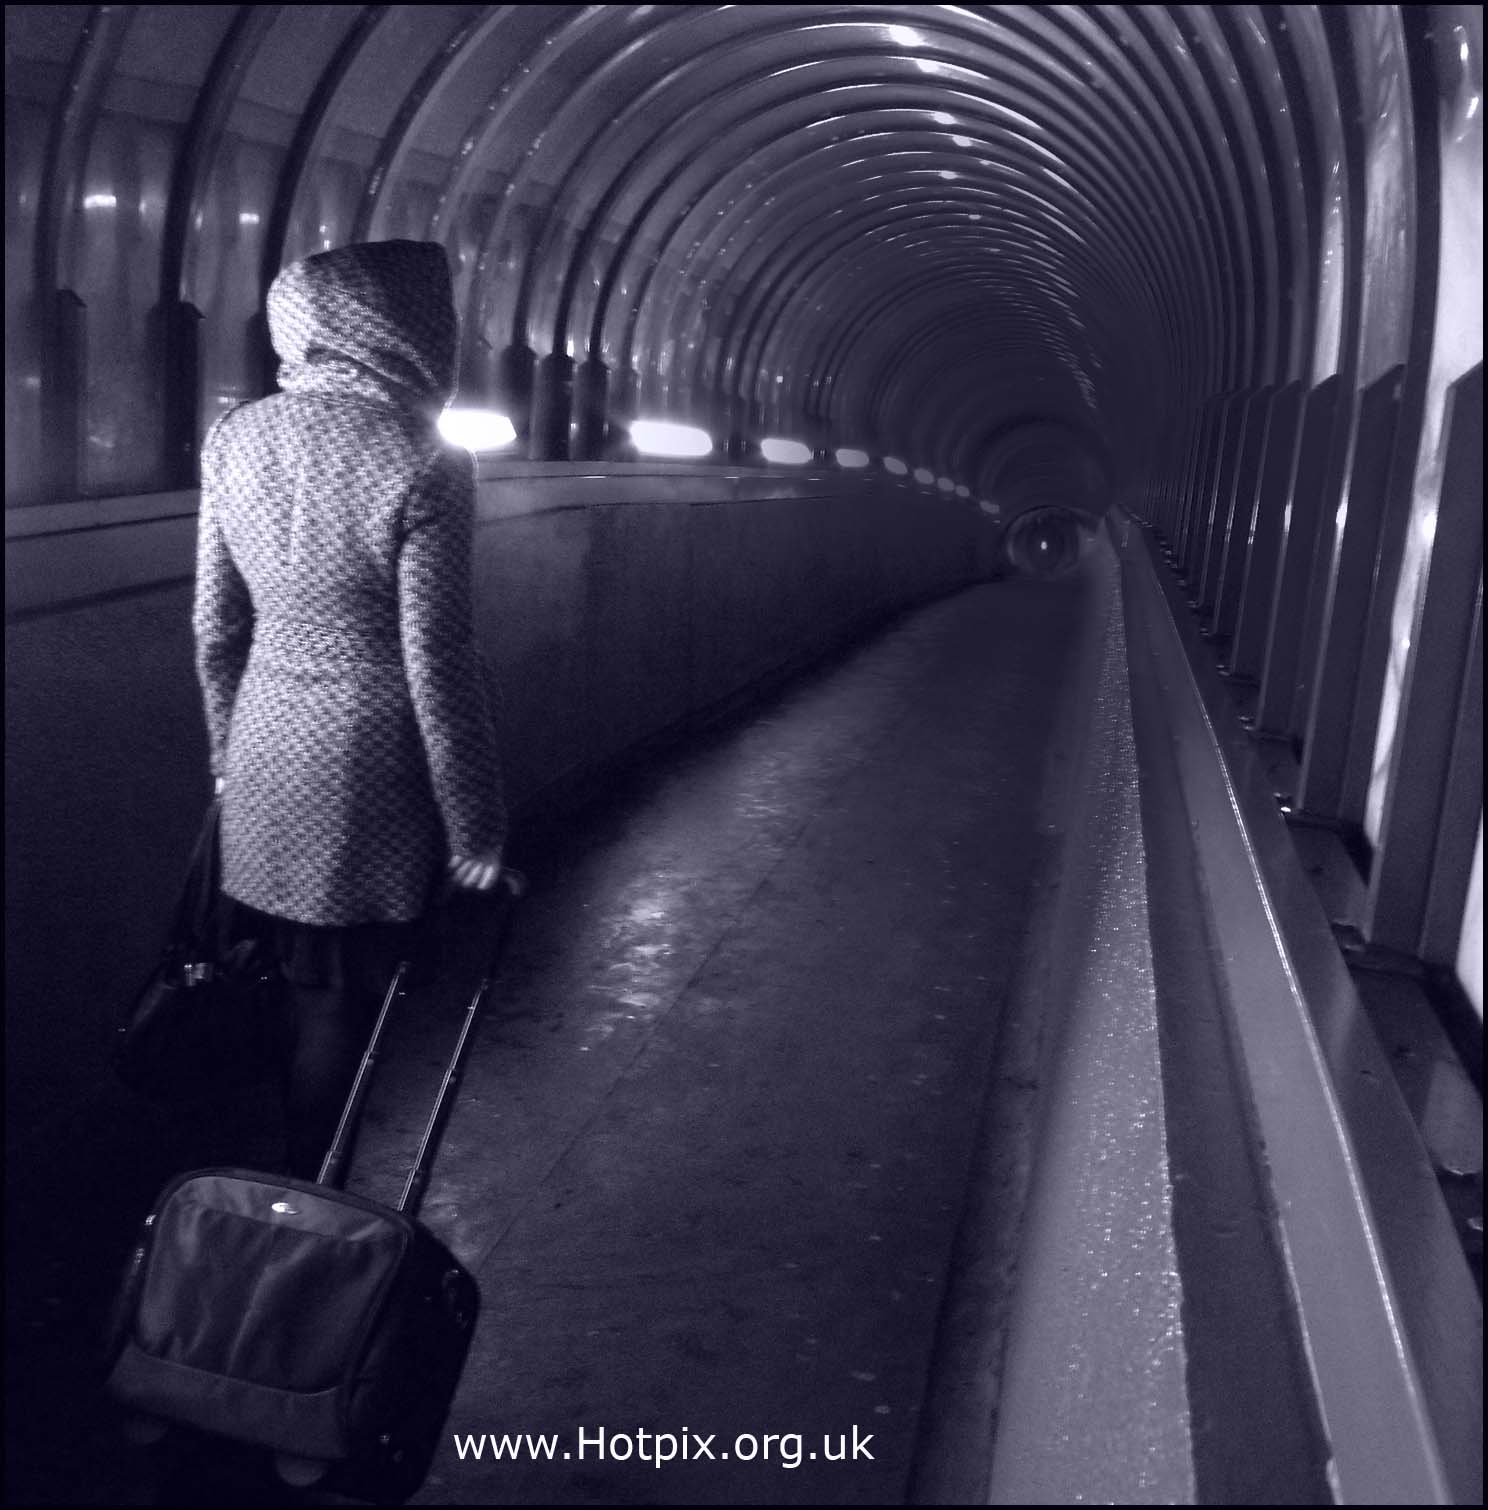 Darlington,railway,bridge,tunnel,path,woman,journey,train,tony,smith,tonysmith,hotpix,hotpixuk,tdk,tdktony,B/W,black,white,mono,monochrome,muchacha,femenina,de,la,mujer,se\u00f1ora,lady,female,girl,\u5973\u6027\u30e1\u30b9\u306e\u5973\u6027\u306e\u5973\u306e\u5b50,\u592b\u4eba\u5973\u6027\u5987\u5973\u5973\u5b69,fille,f\u00e9minine,femme,dame